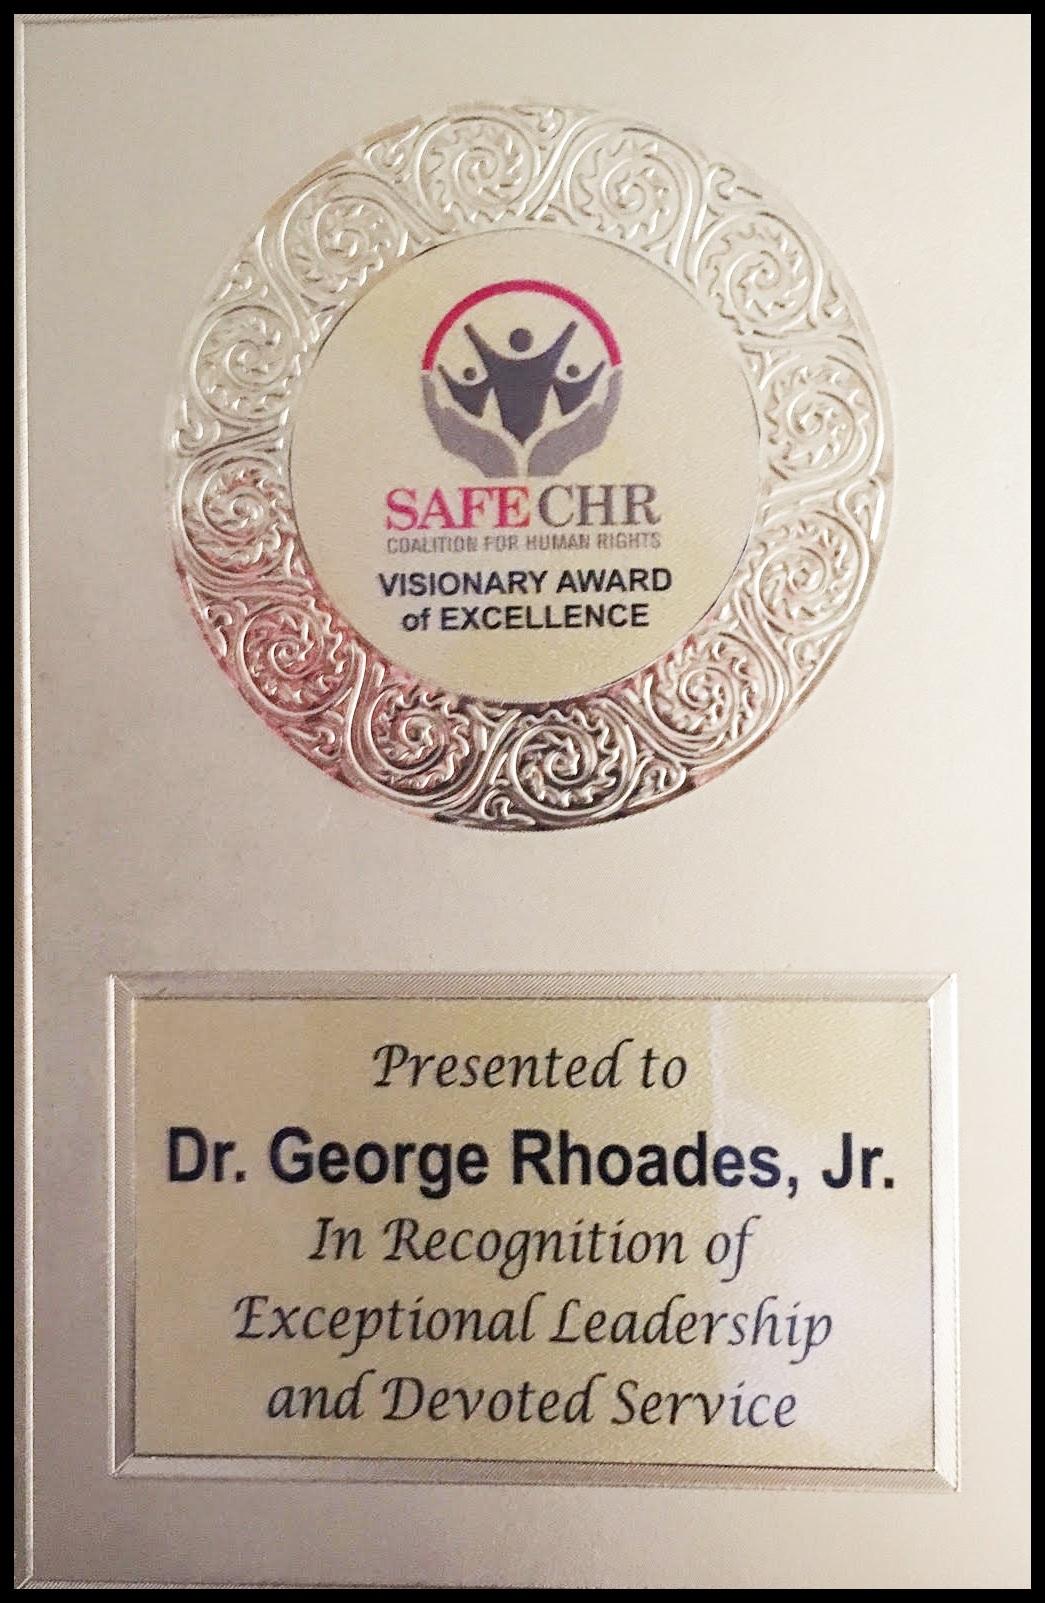 Leadership Award - Dr. Rhoades